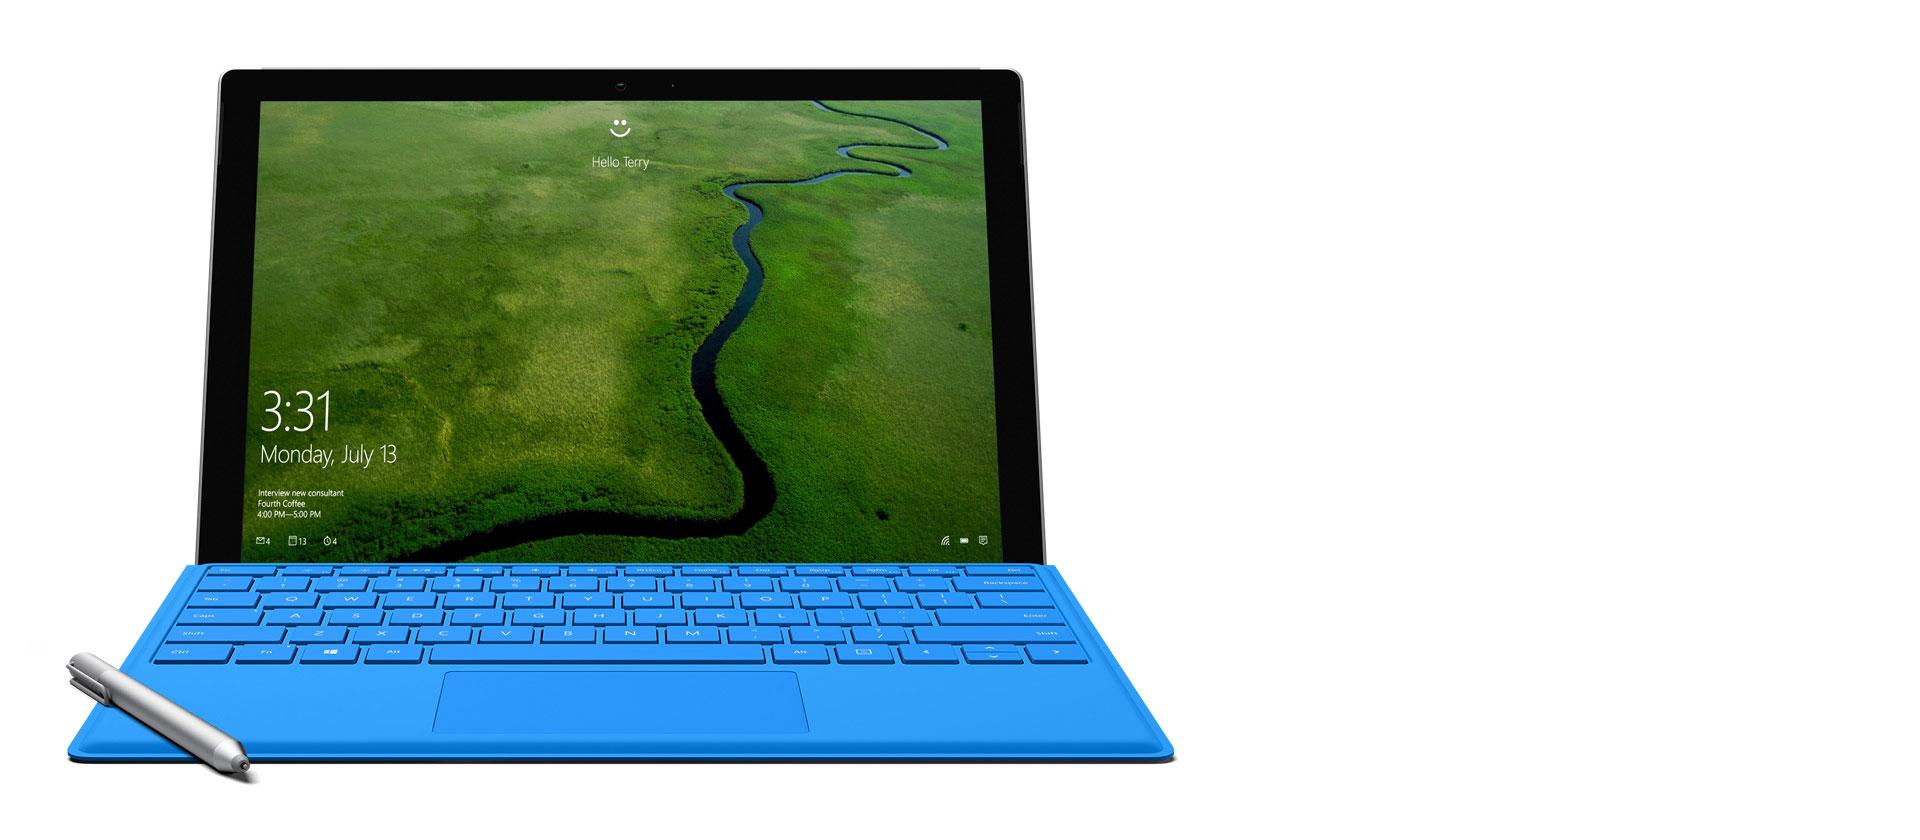 Microsoft Surface Pro 4 Pr 228 Sentiert Update